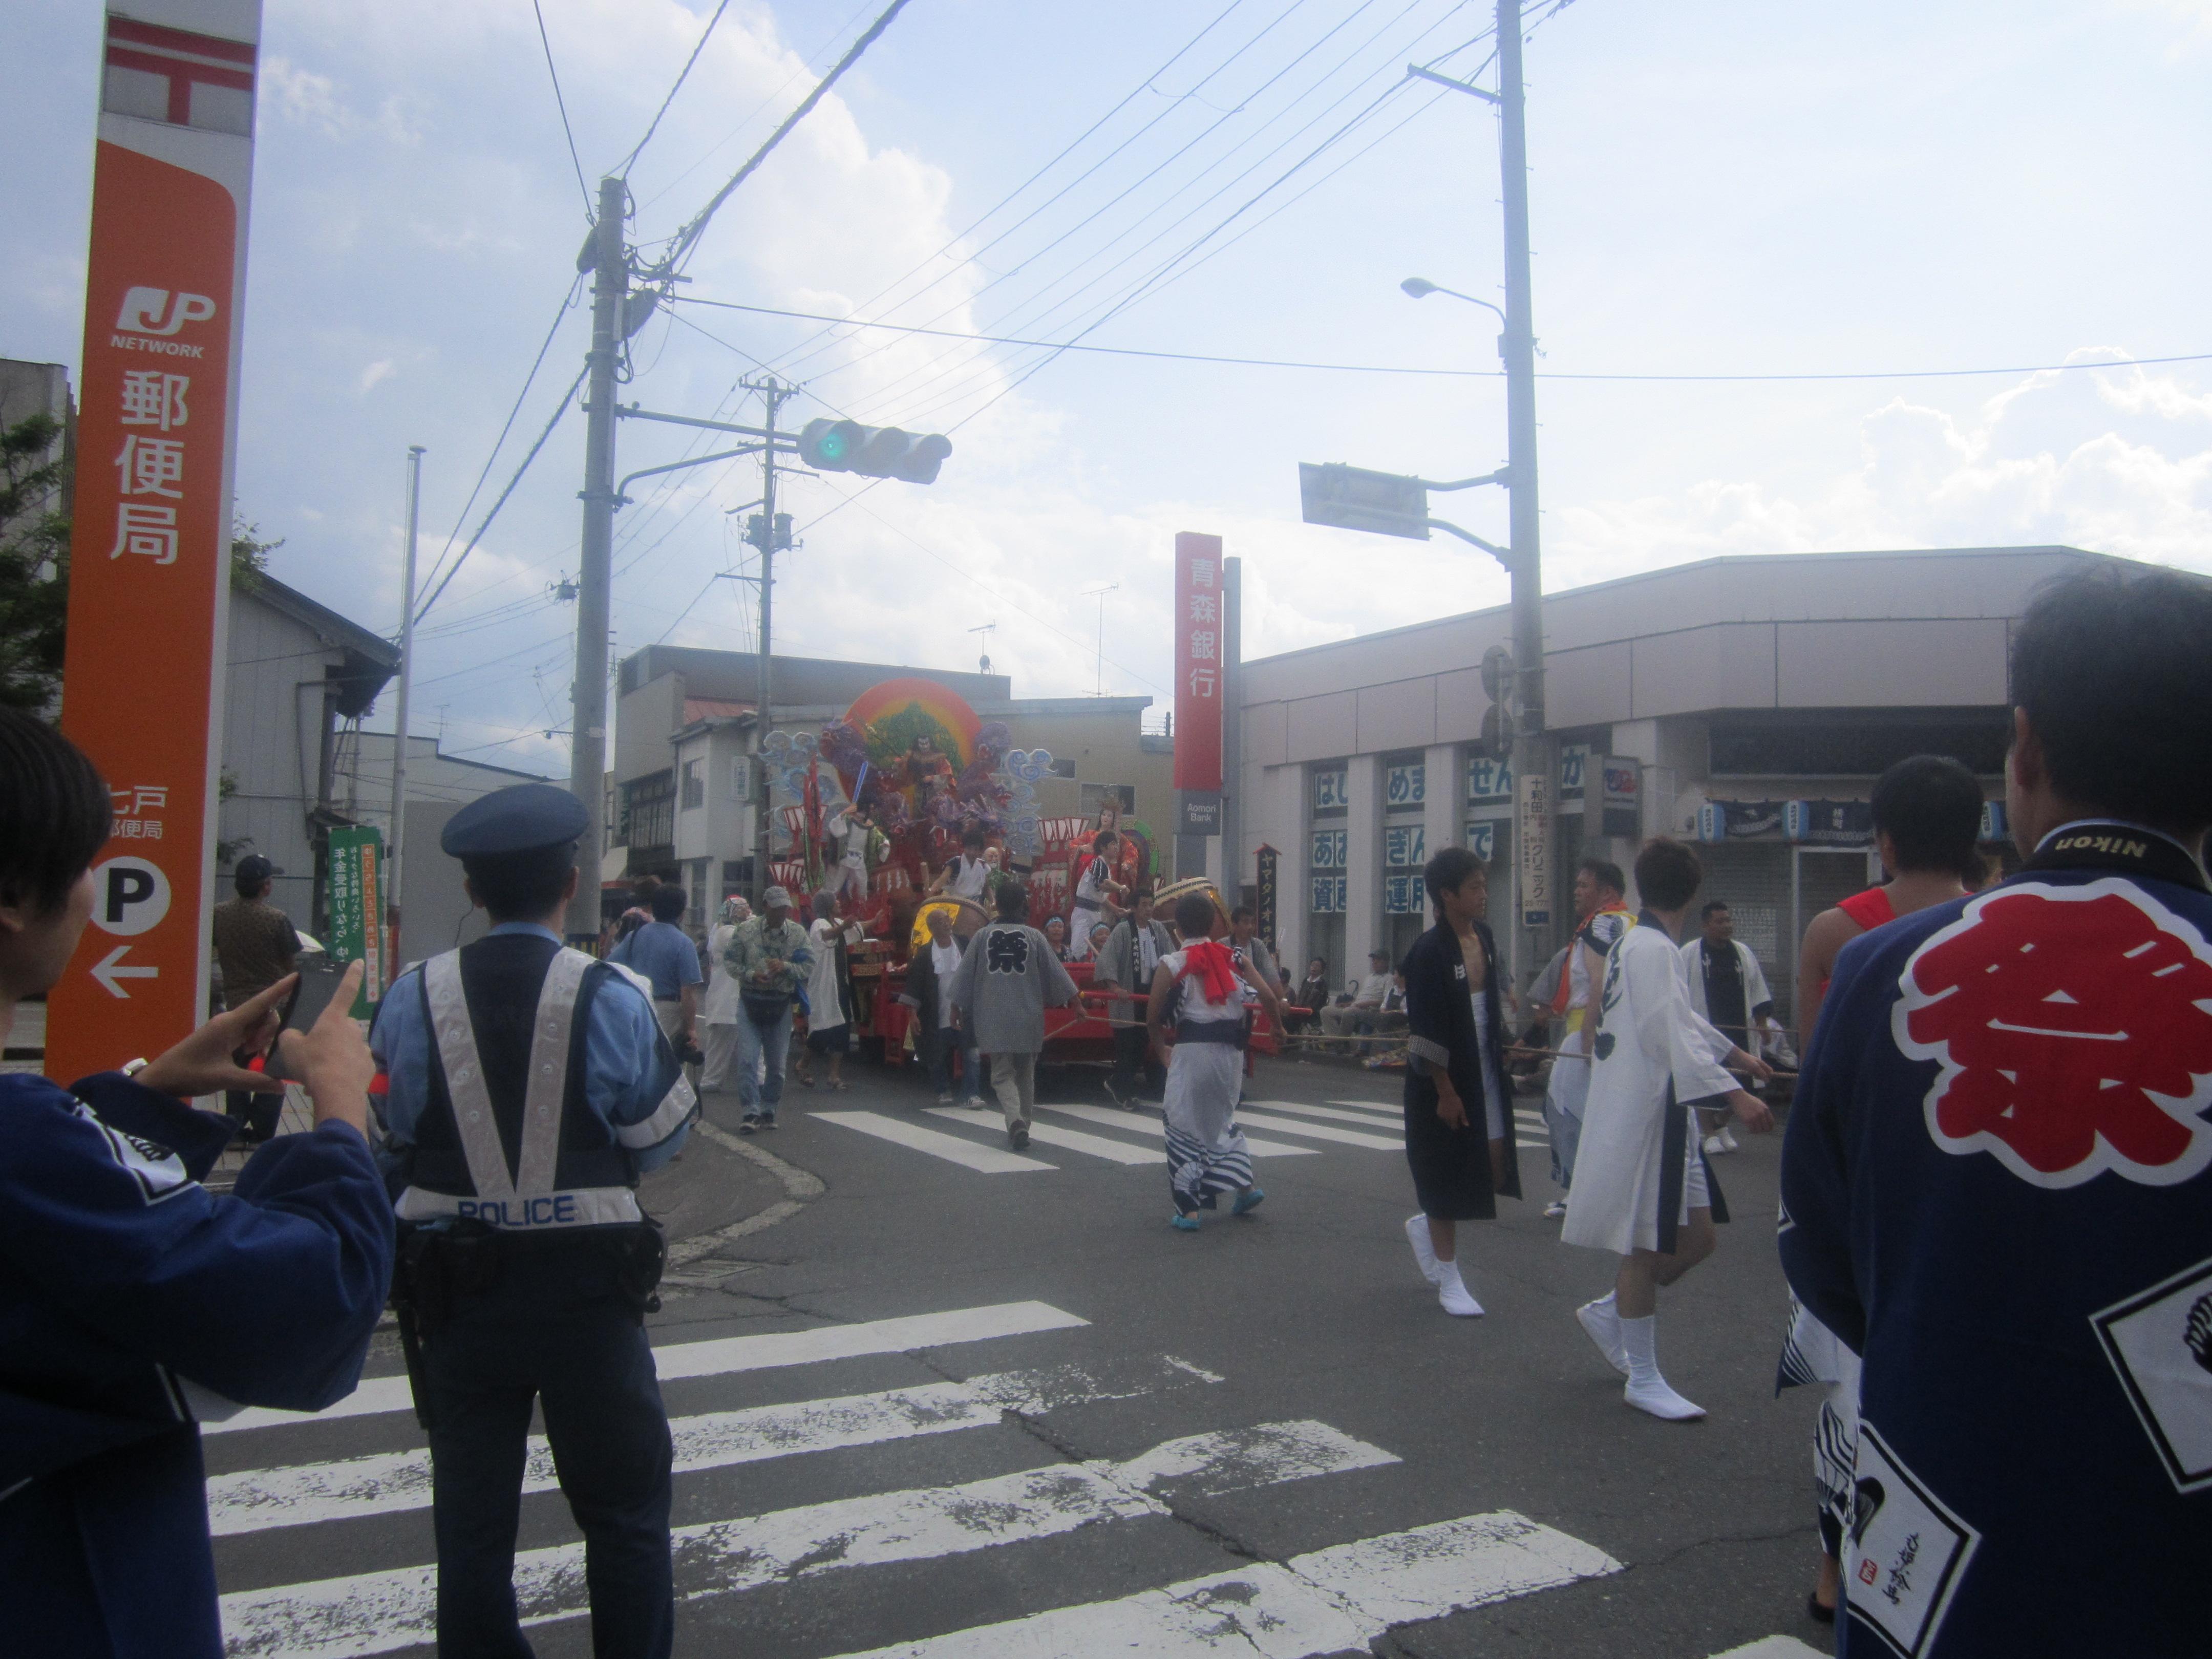 IMG 4240 - 麻布十番納涼祭り25,26日(七戸町出店)